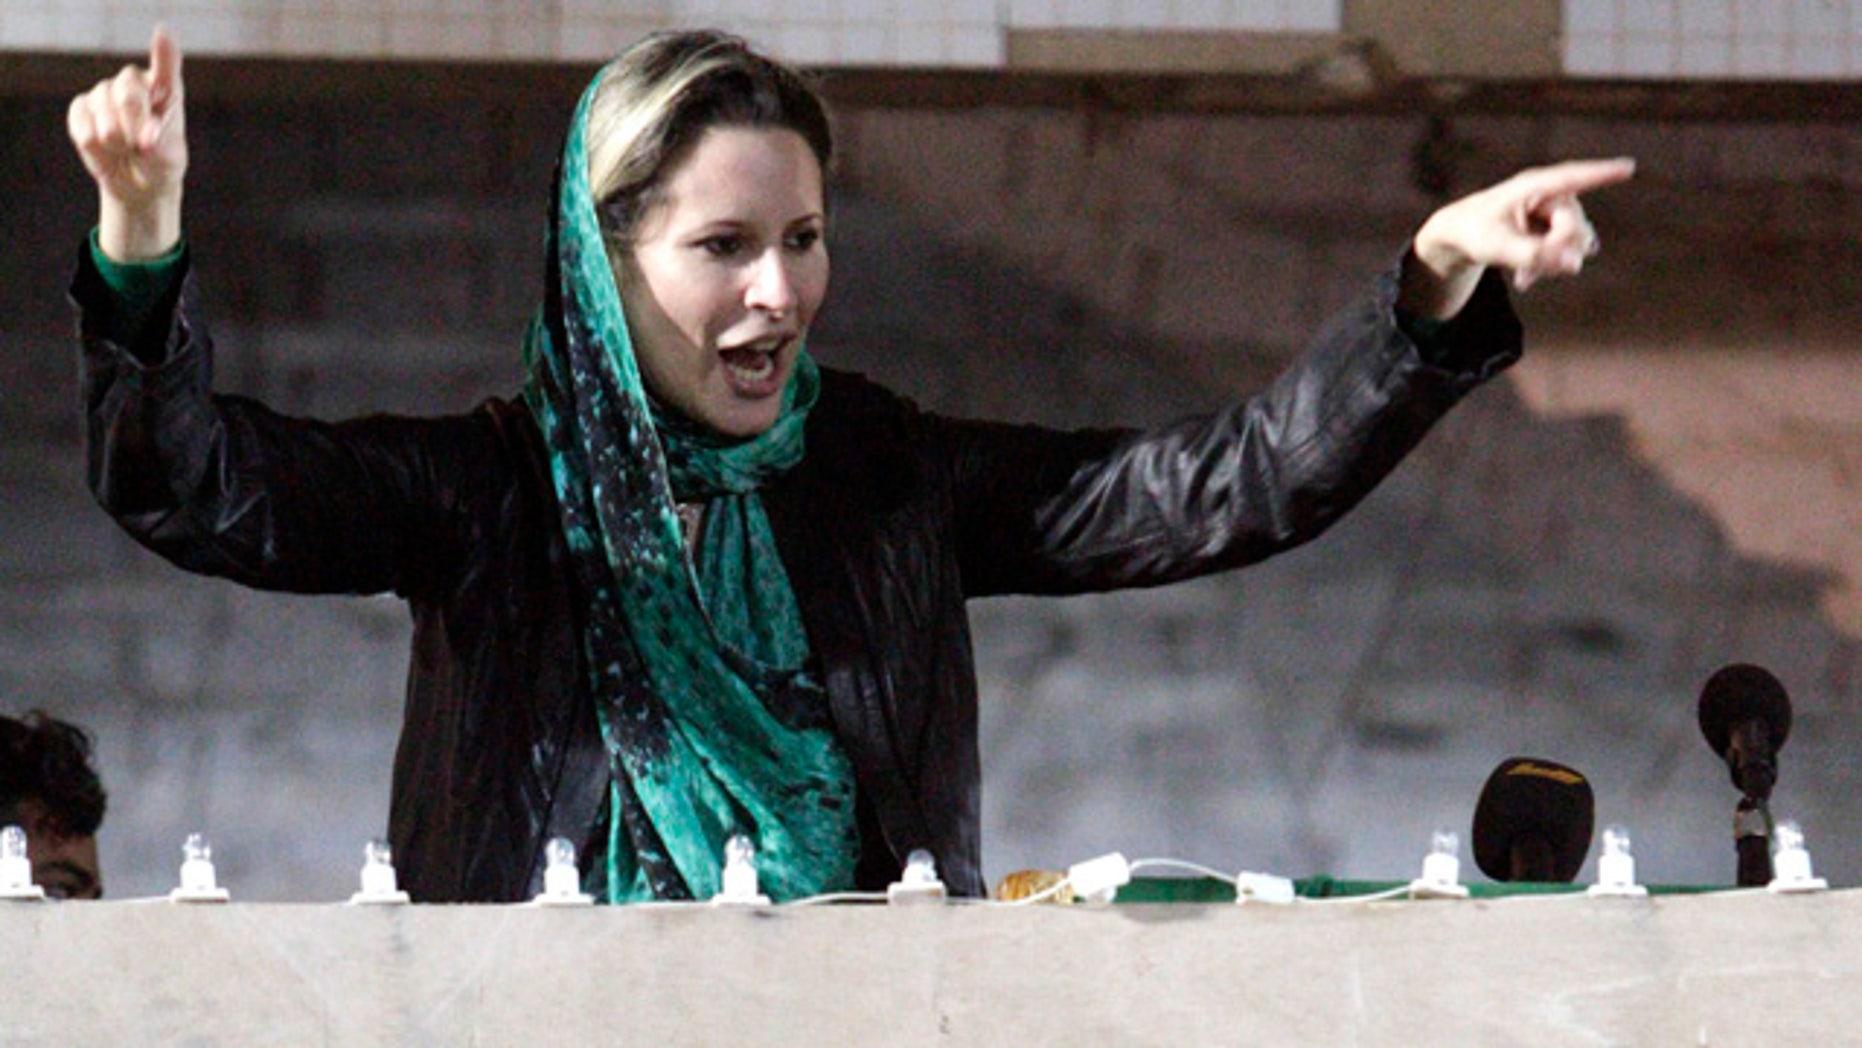 April 15: Aisha Qaddafi, daughter of Libyan leader Muammar al-Qaddafi, encourages Libyan people gathering at the Bab Al Azizia compound in Tripoli, Libya.